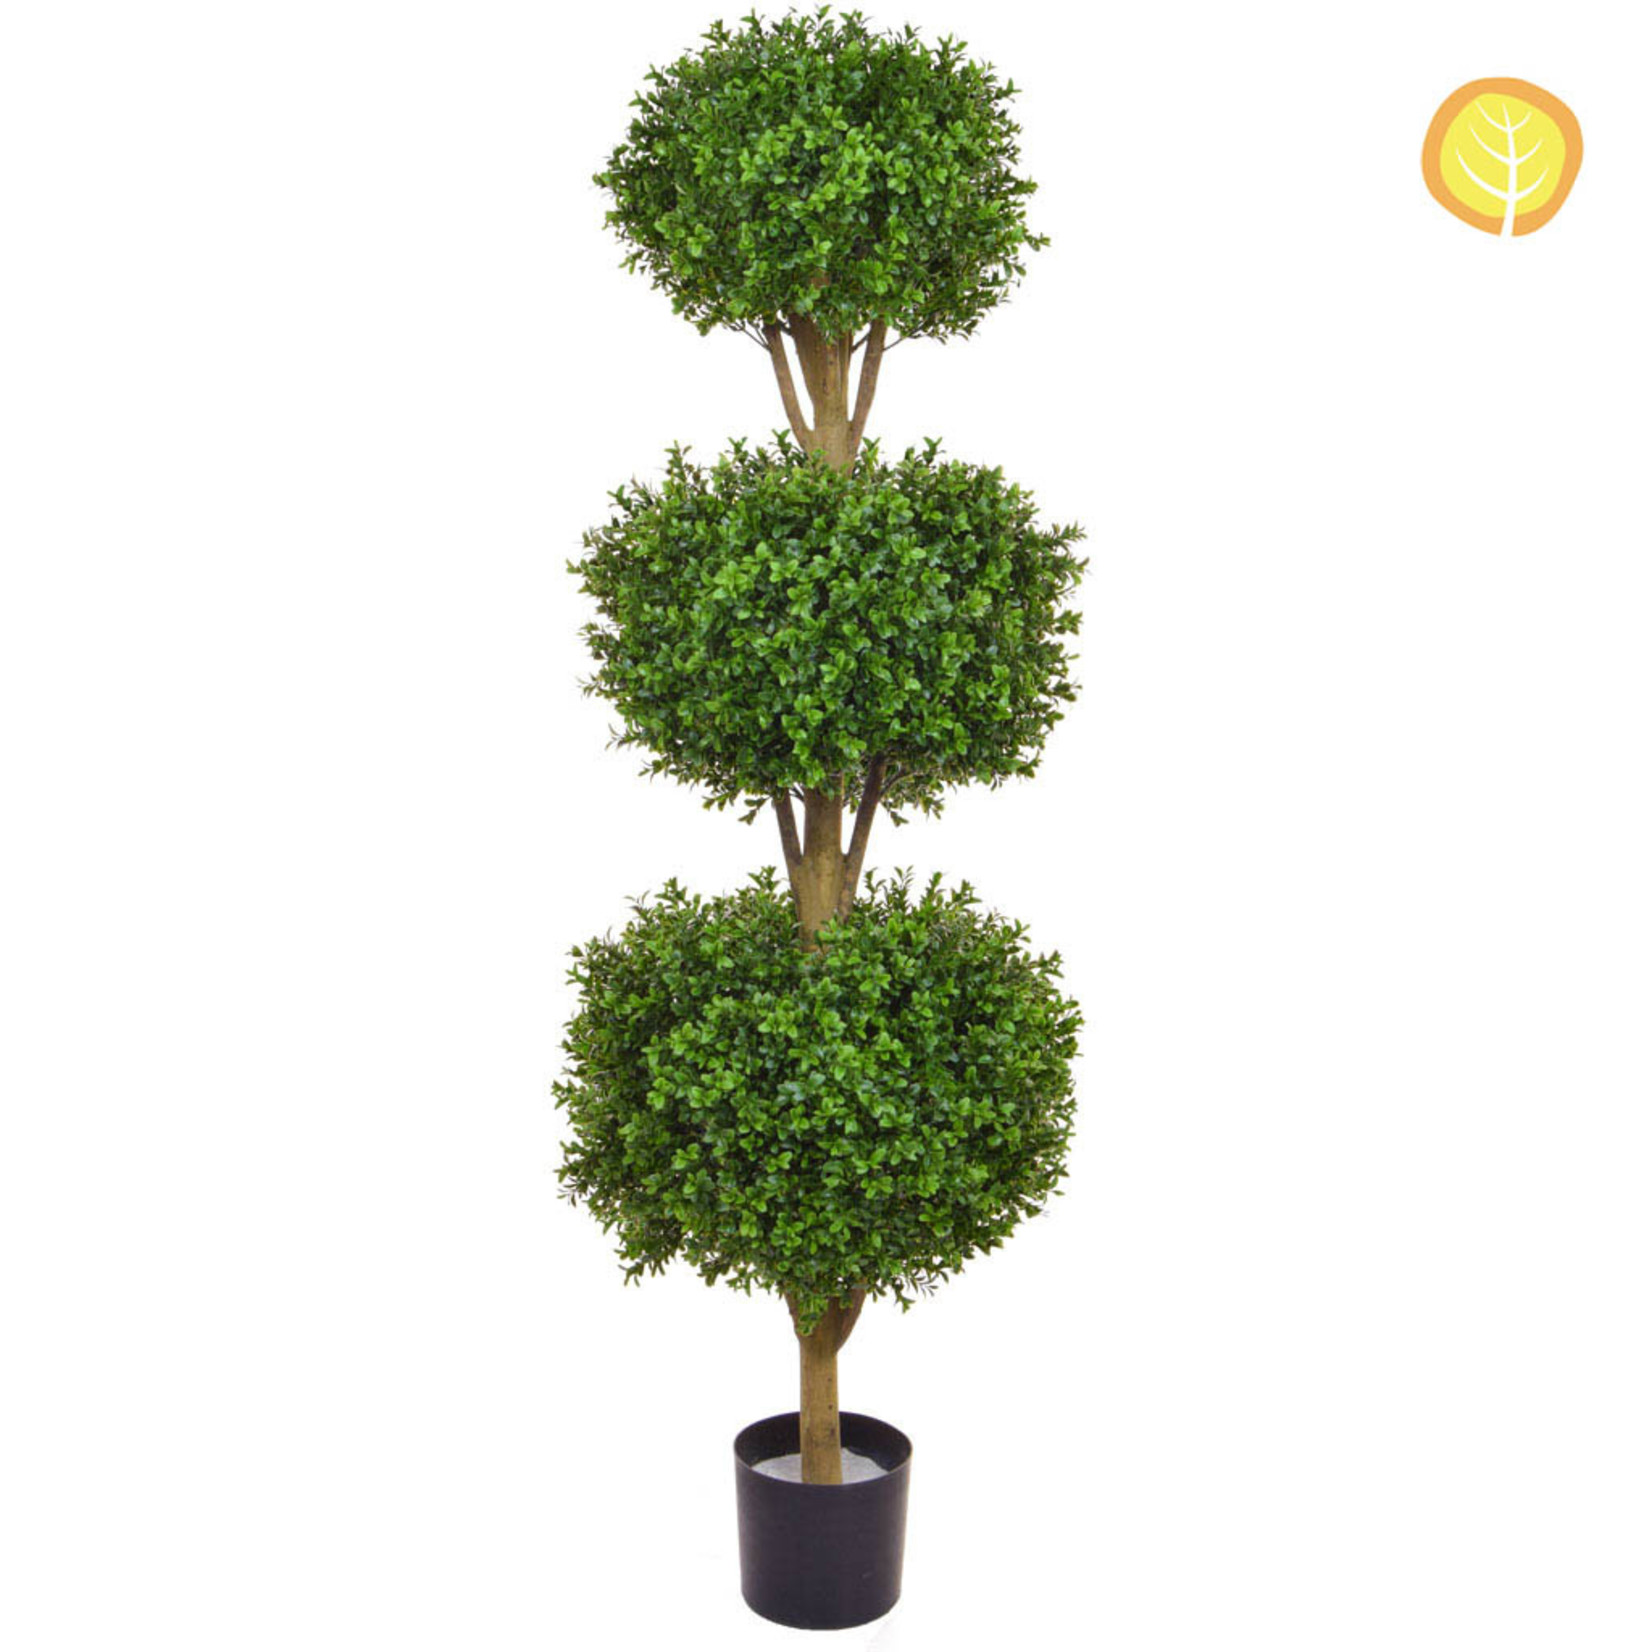 Topiary New Buxus Triple Ball 120cm - UV Resistant